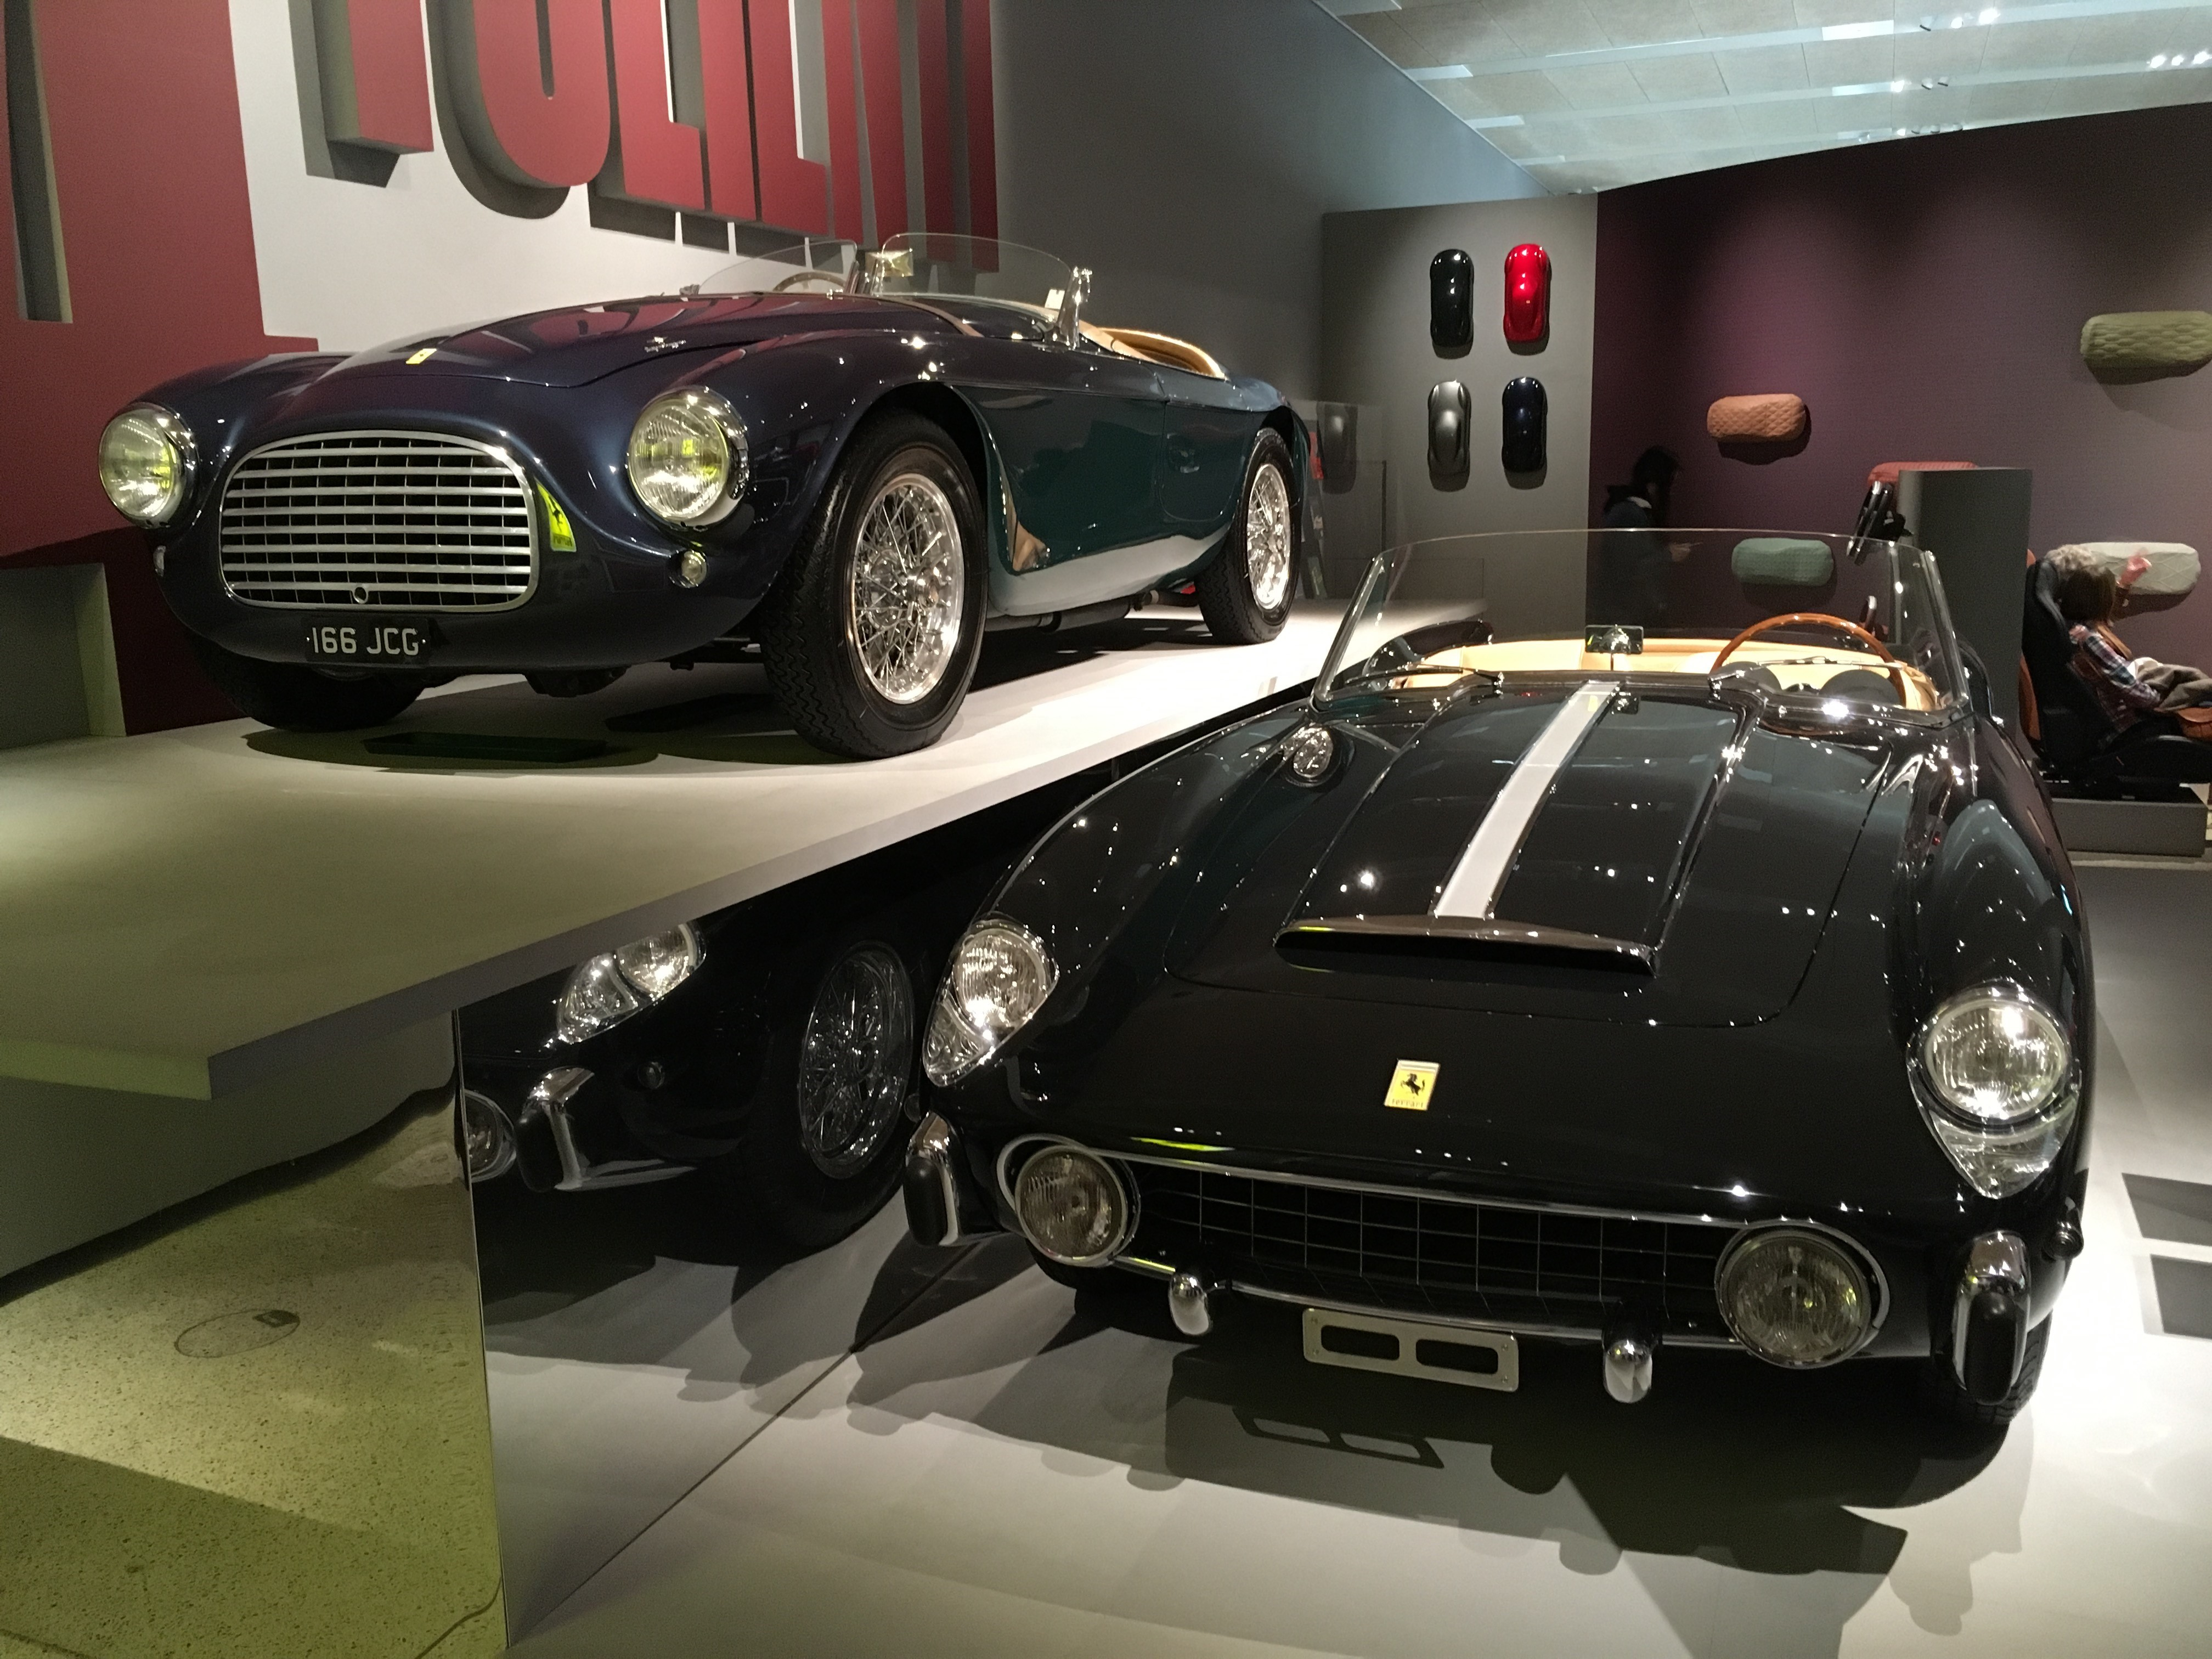 Ferrari-exhib-classic-vs-new.jpg#asset:2592